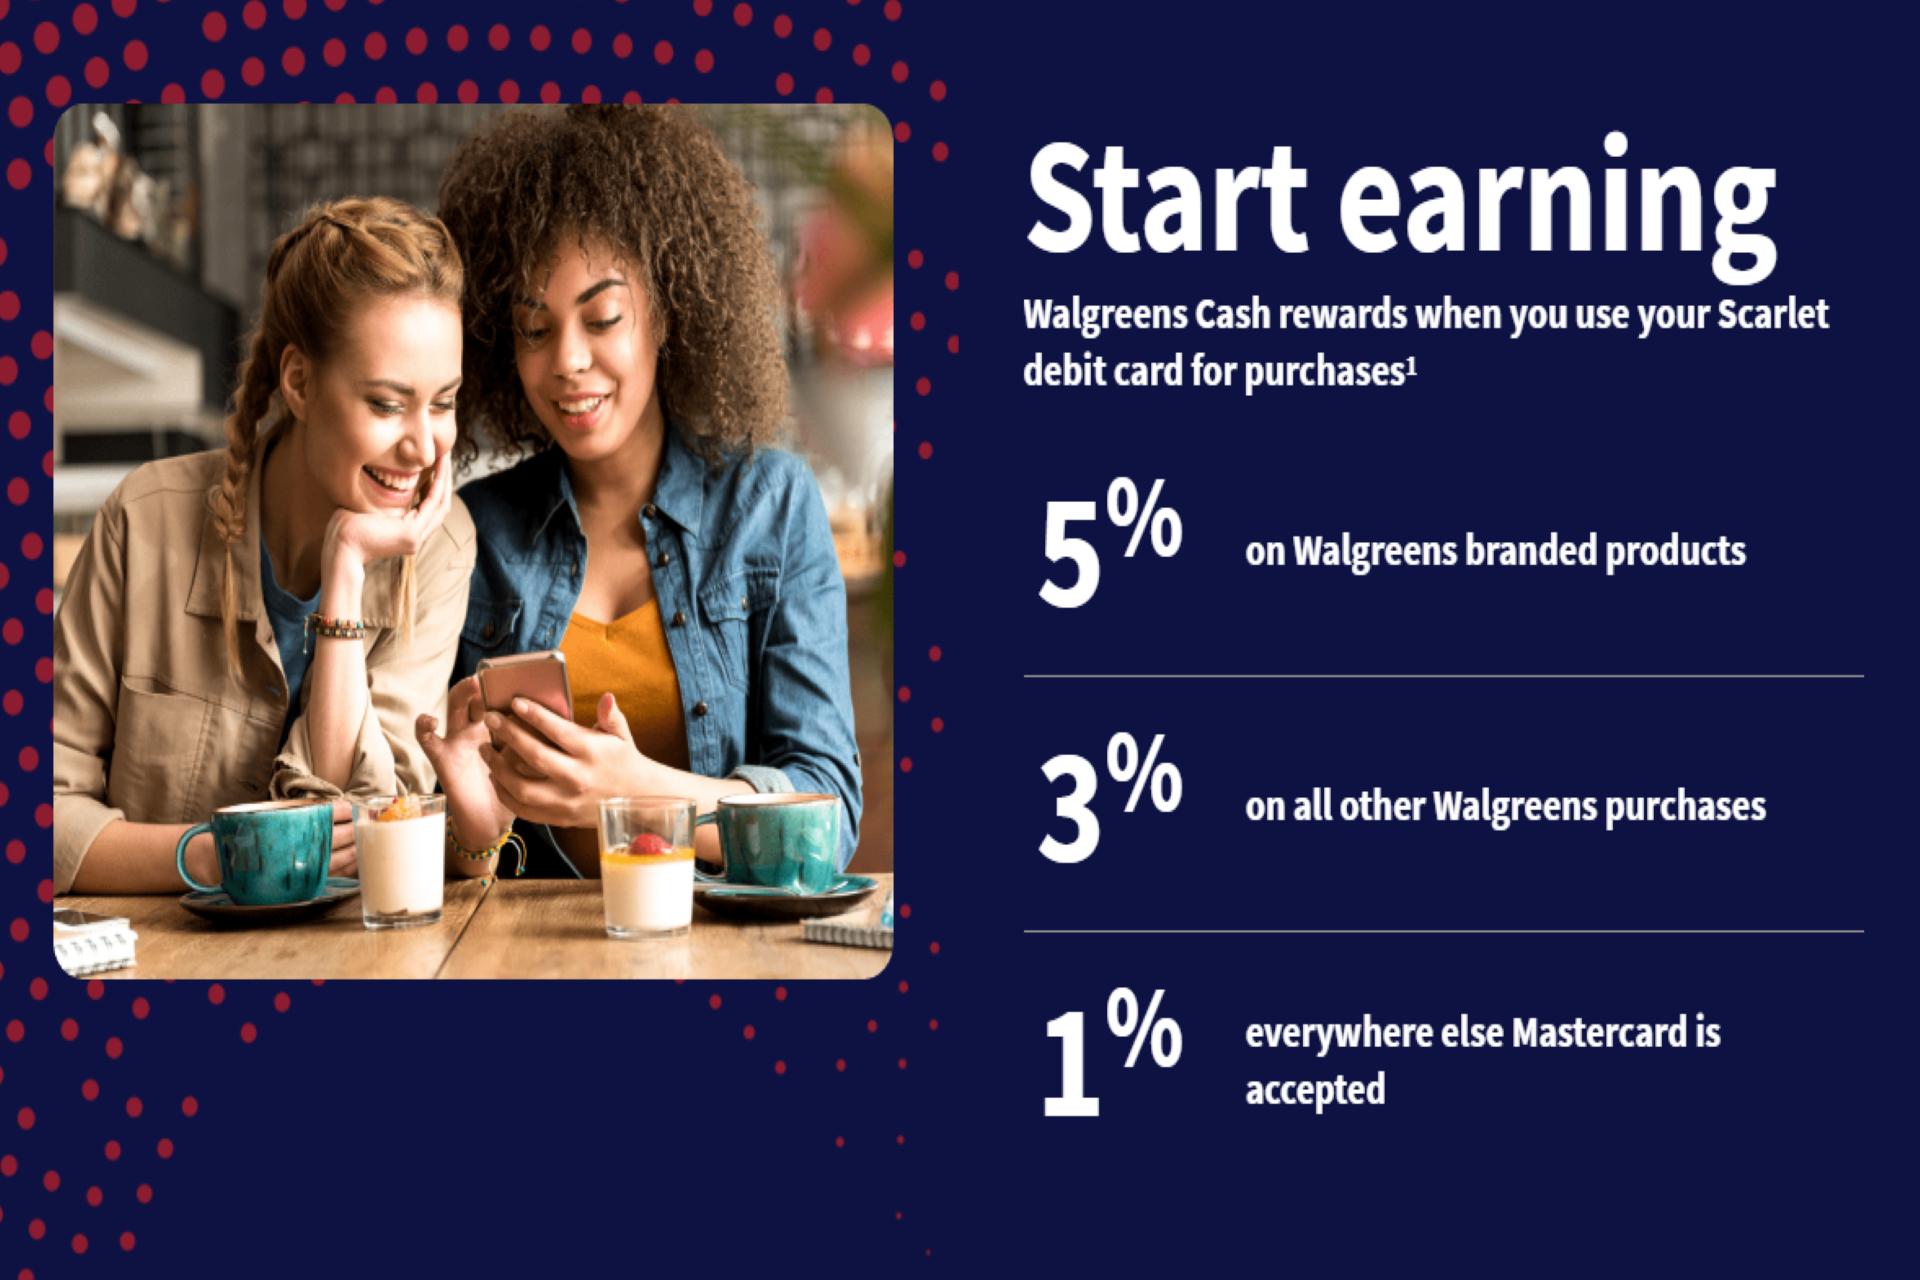 new myWalgreens Scarlet Mastercard debit card